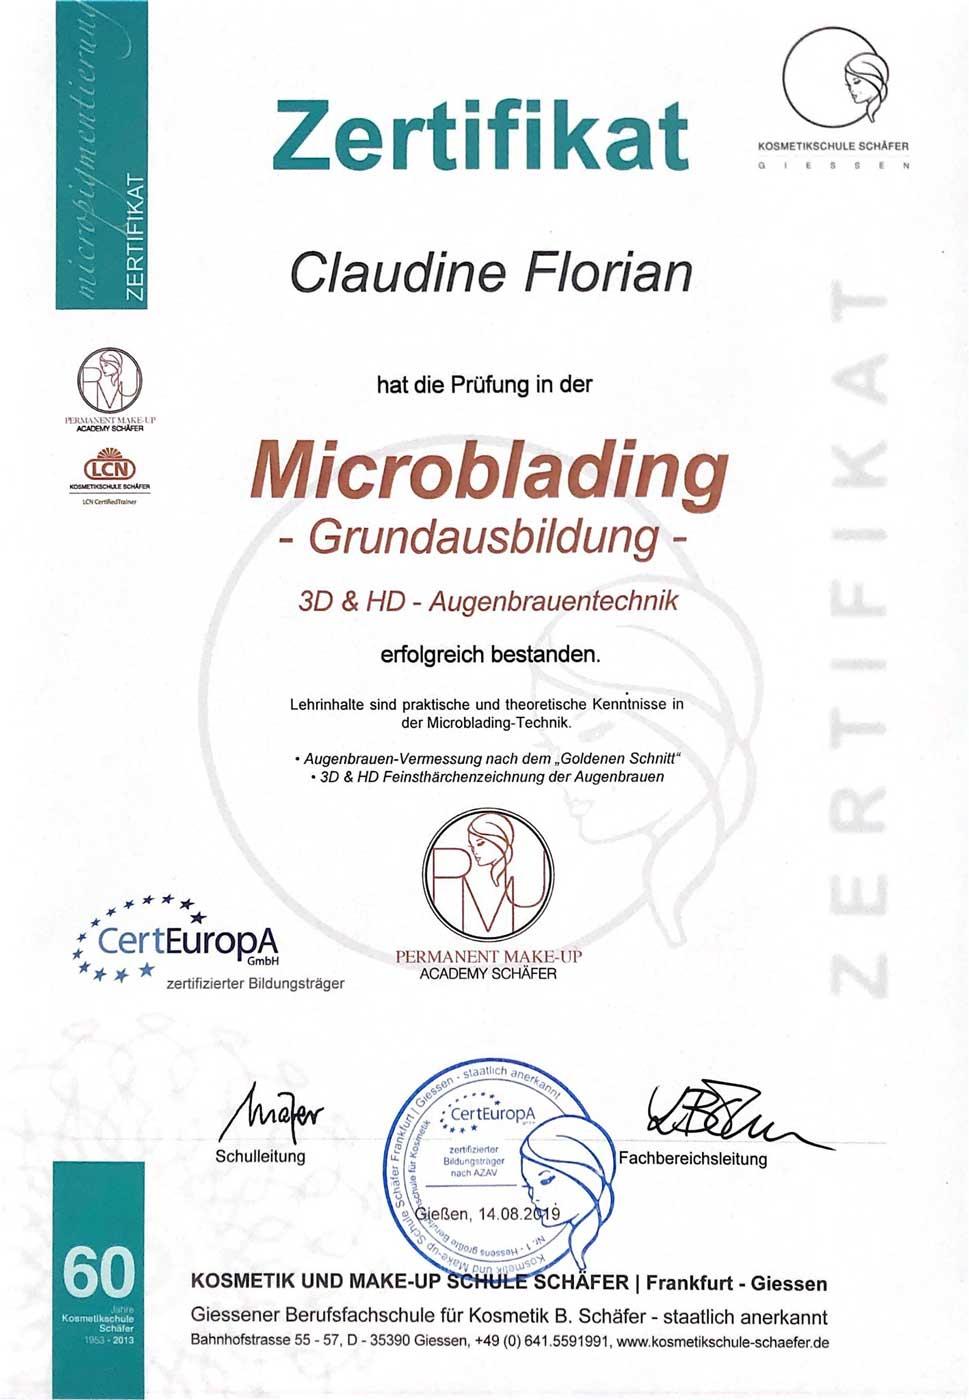 zertifikat_microblading_grund